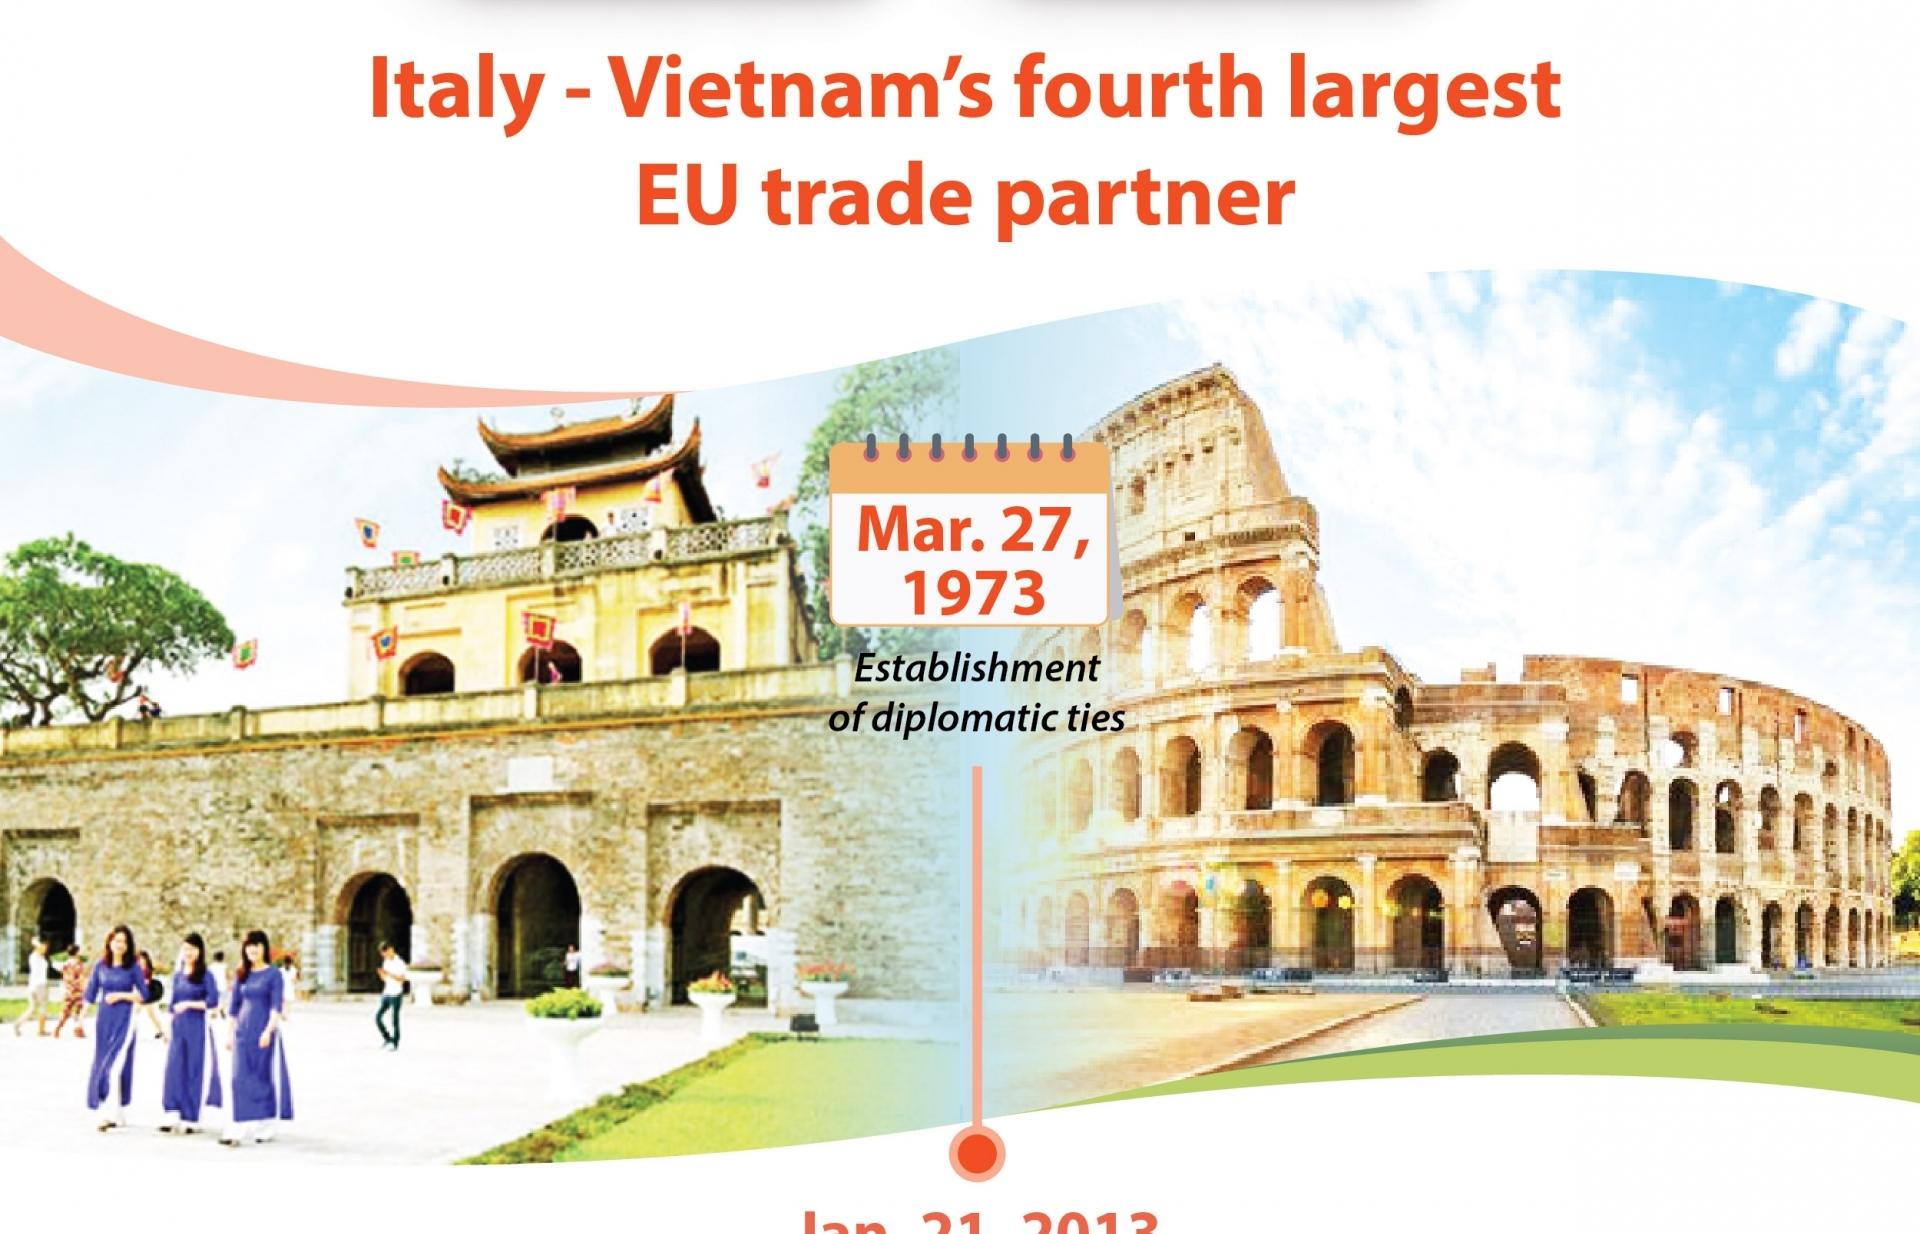 Italy - Vietnam's fourth largest EU trade partner